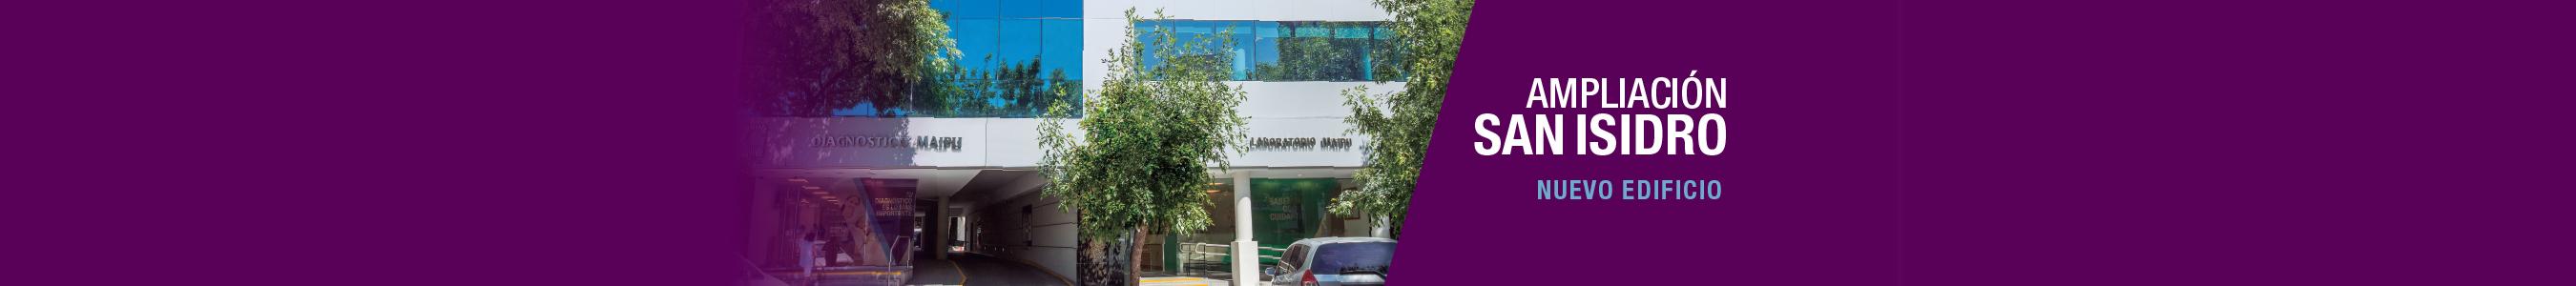 Banner-Web_Reapertura-San-Isidro